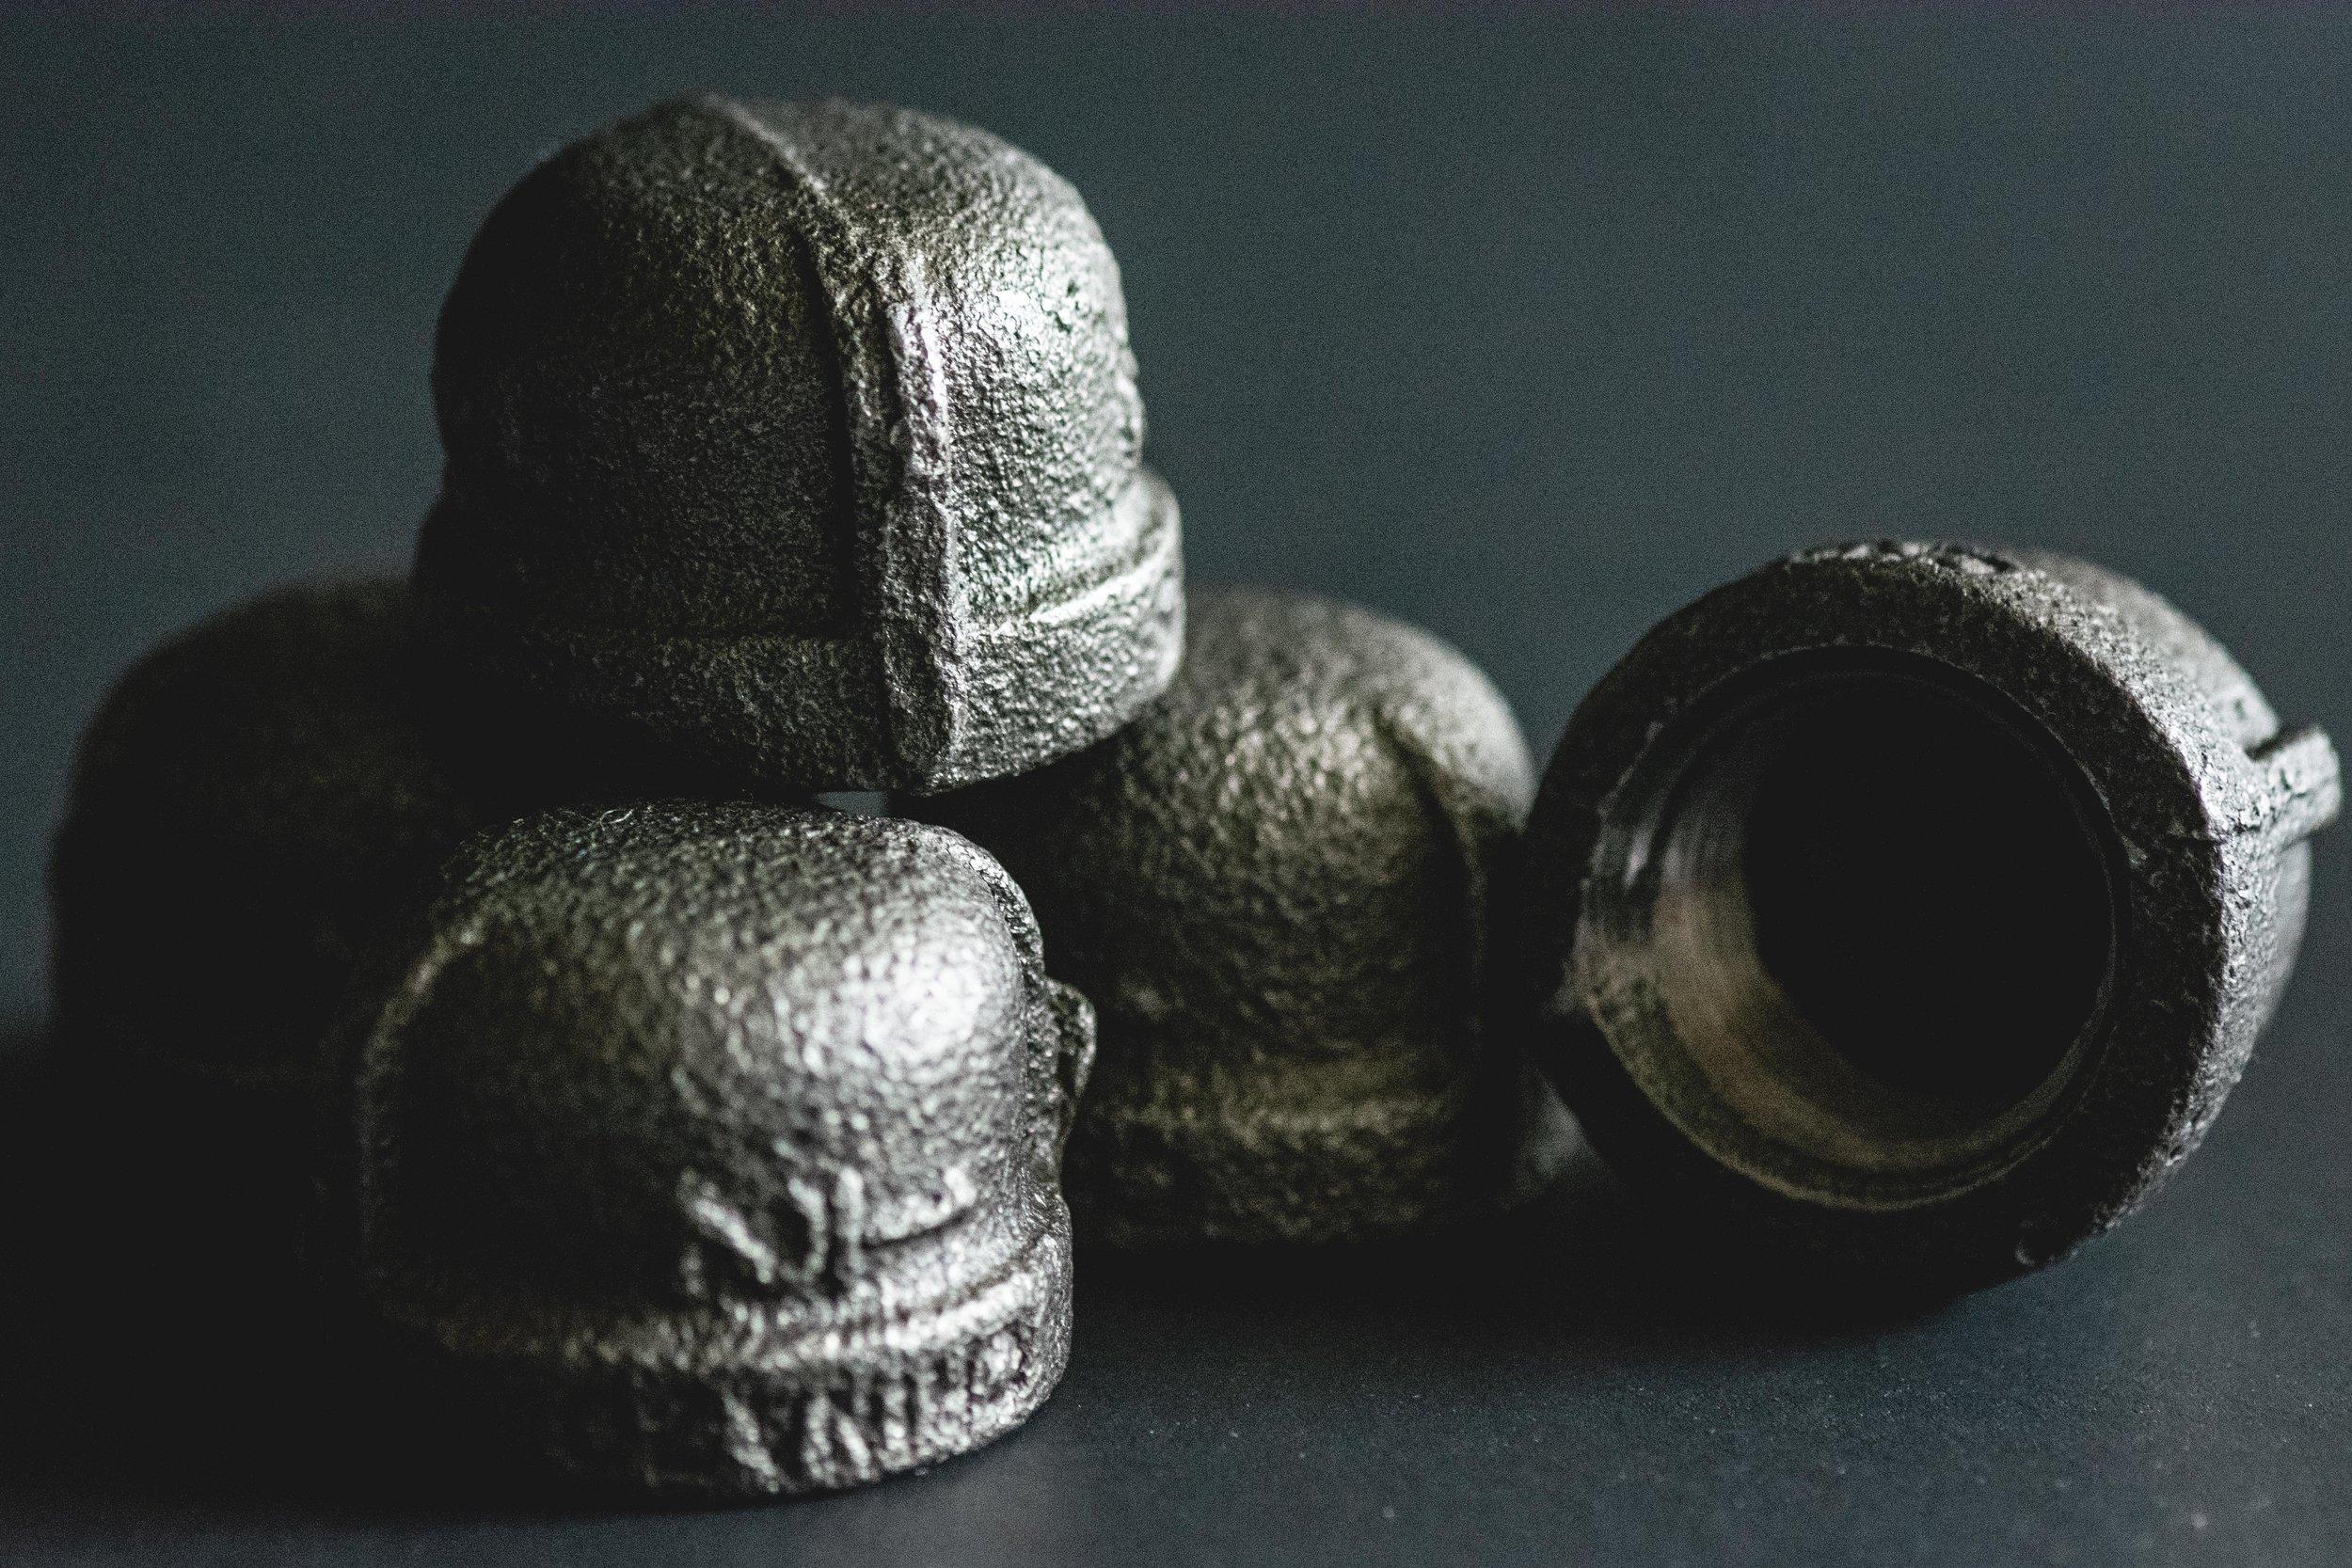 1/2 inch pipe caps